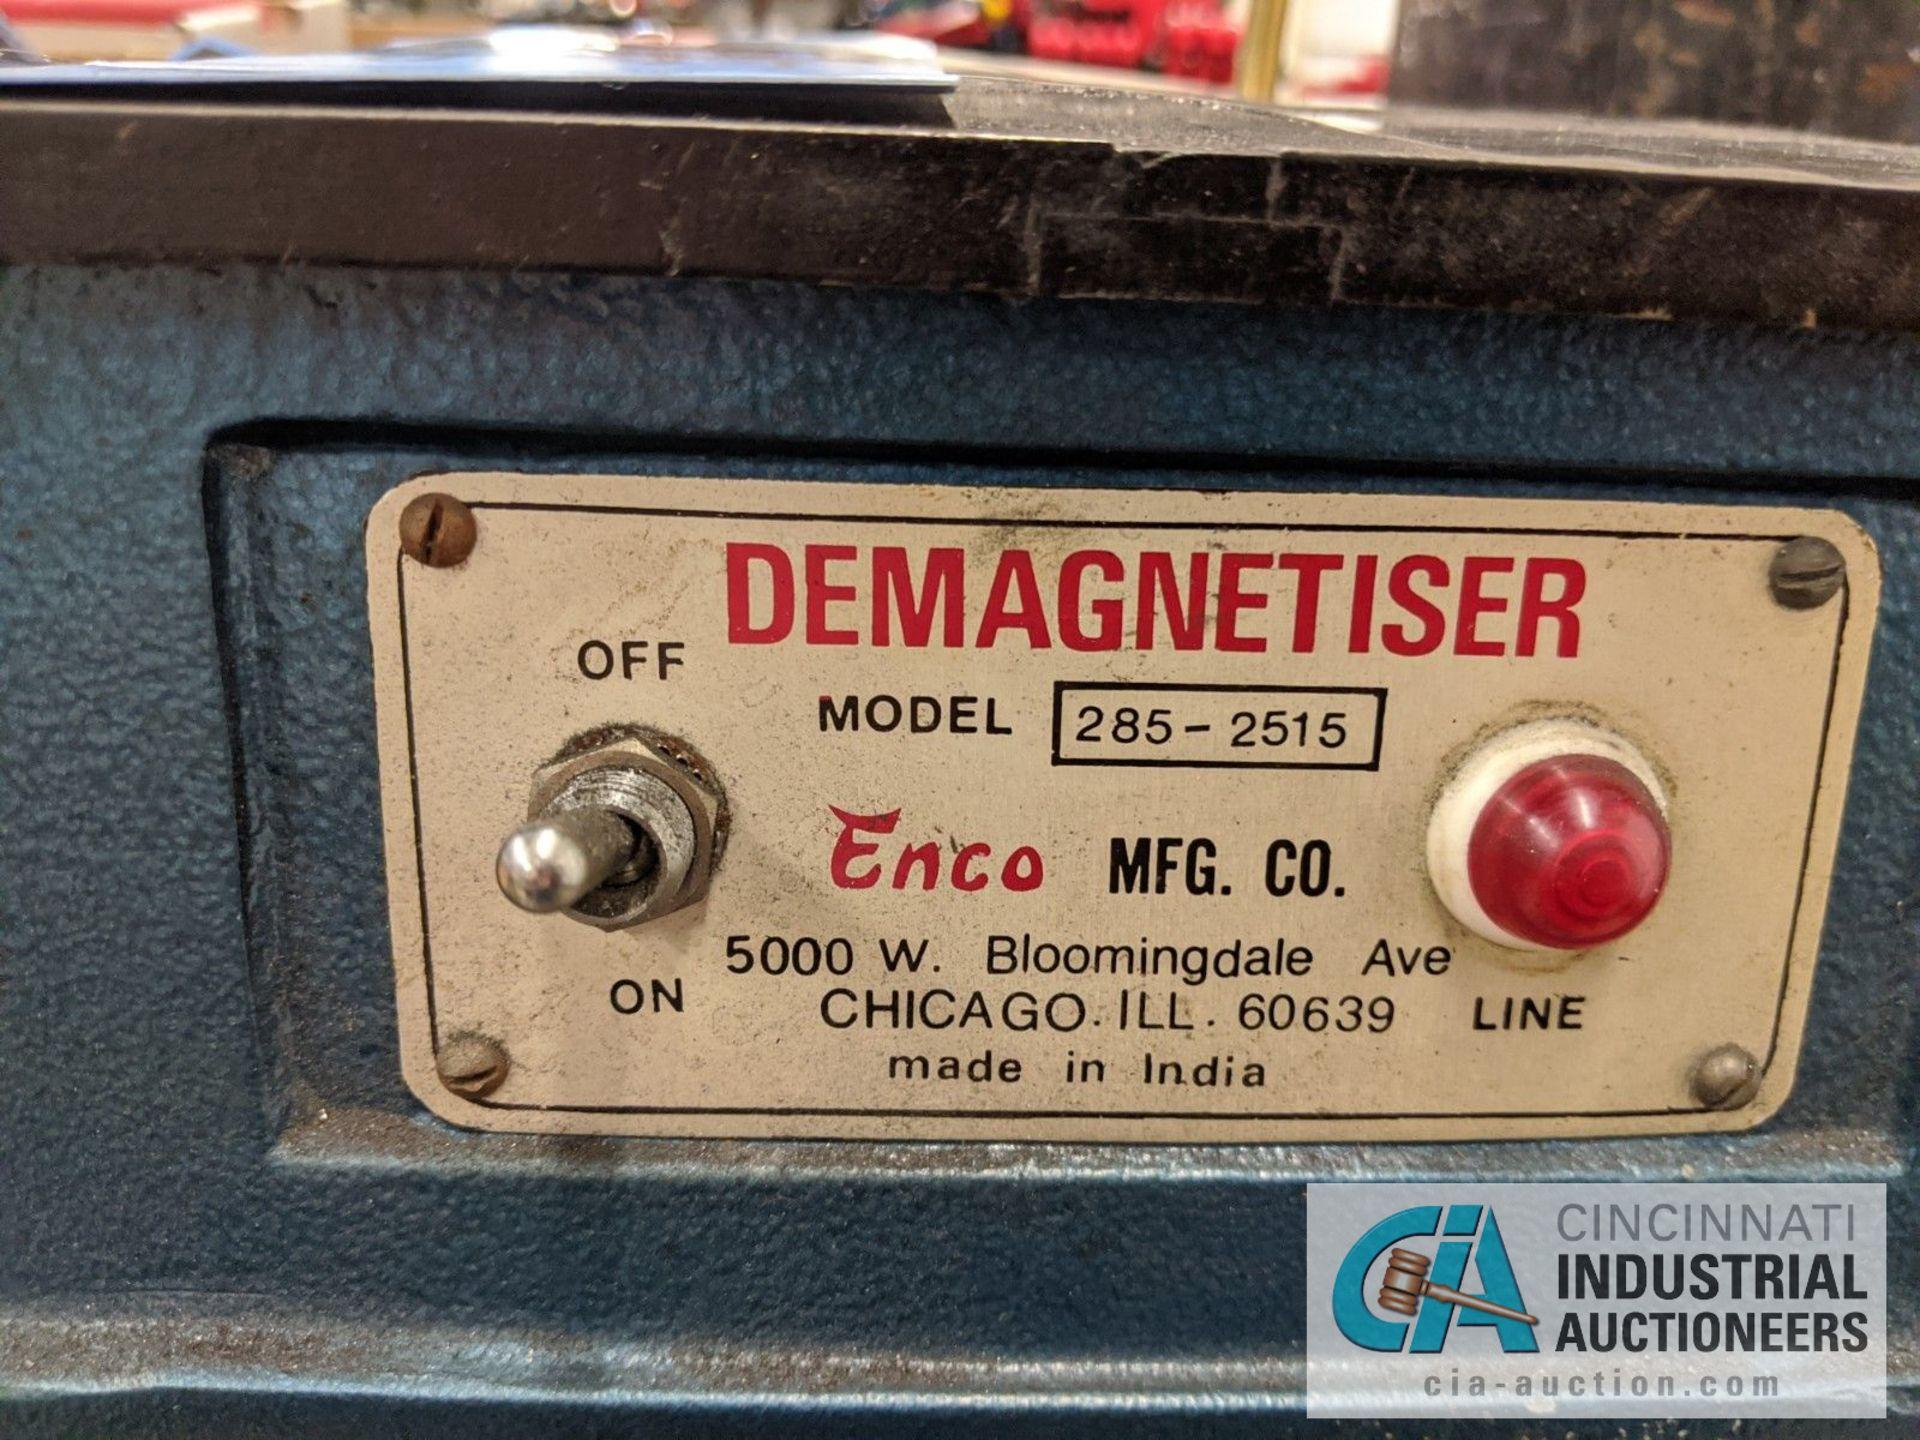 ENCO MODEL 285-2515 DEMAG UNIT - Image 2 of 3